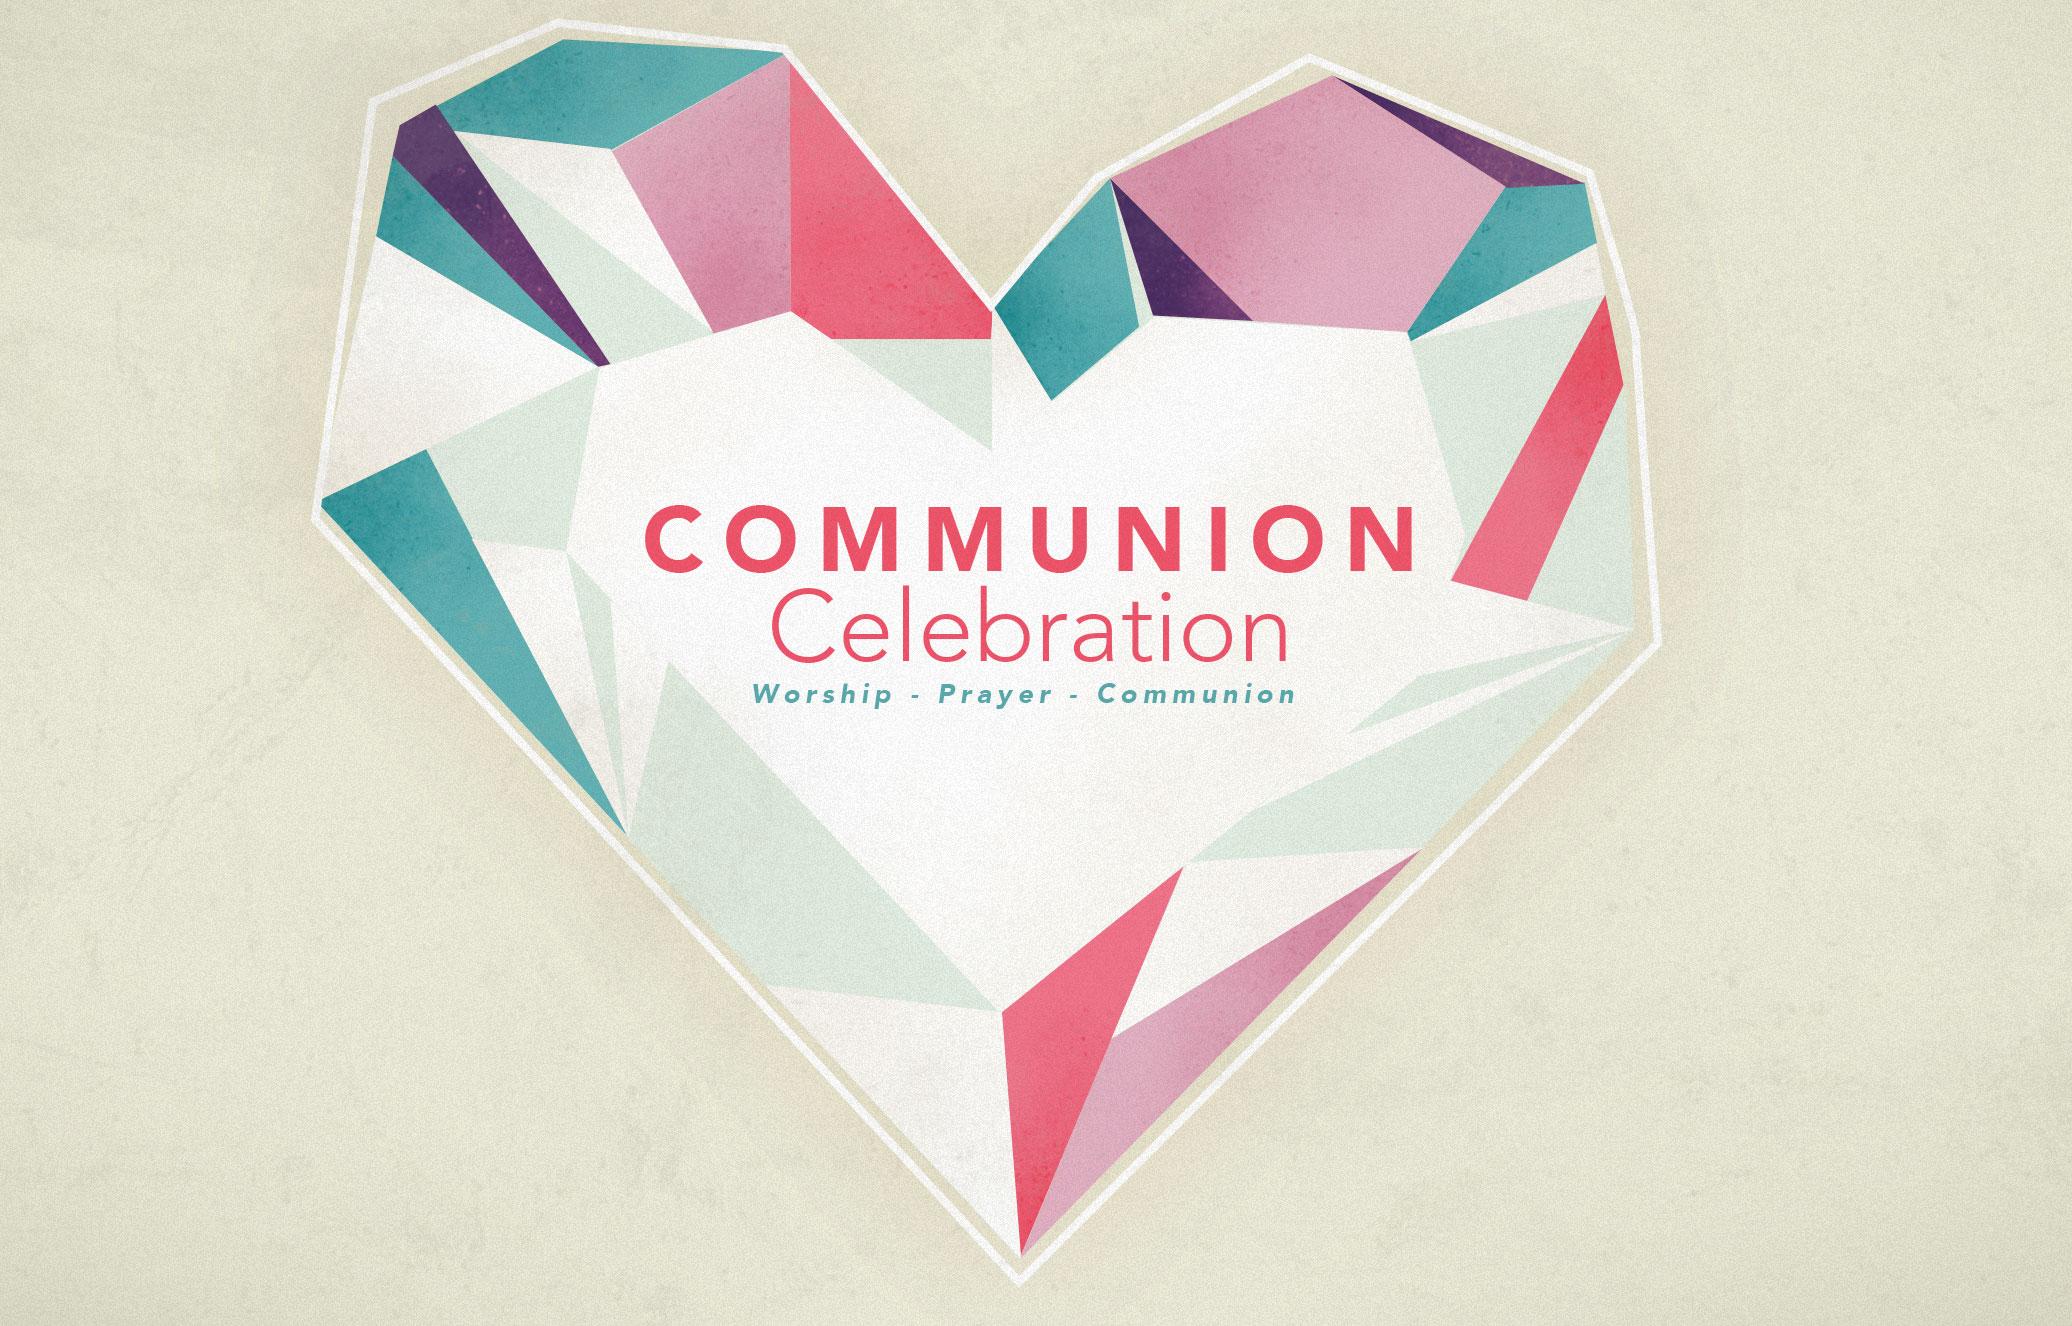 Communion Celebration banner